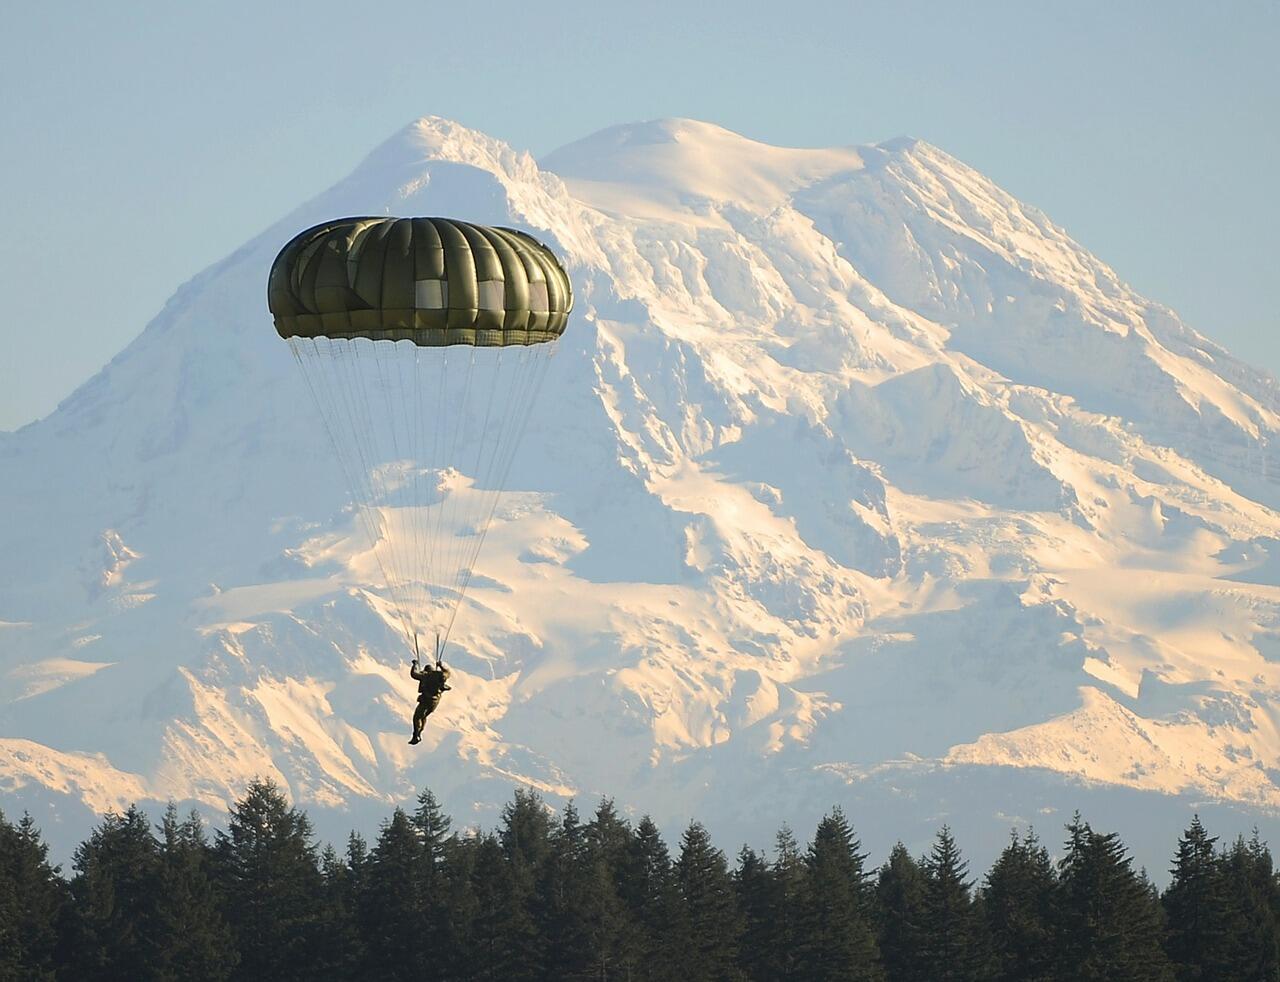 parachute skydiver.jpg